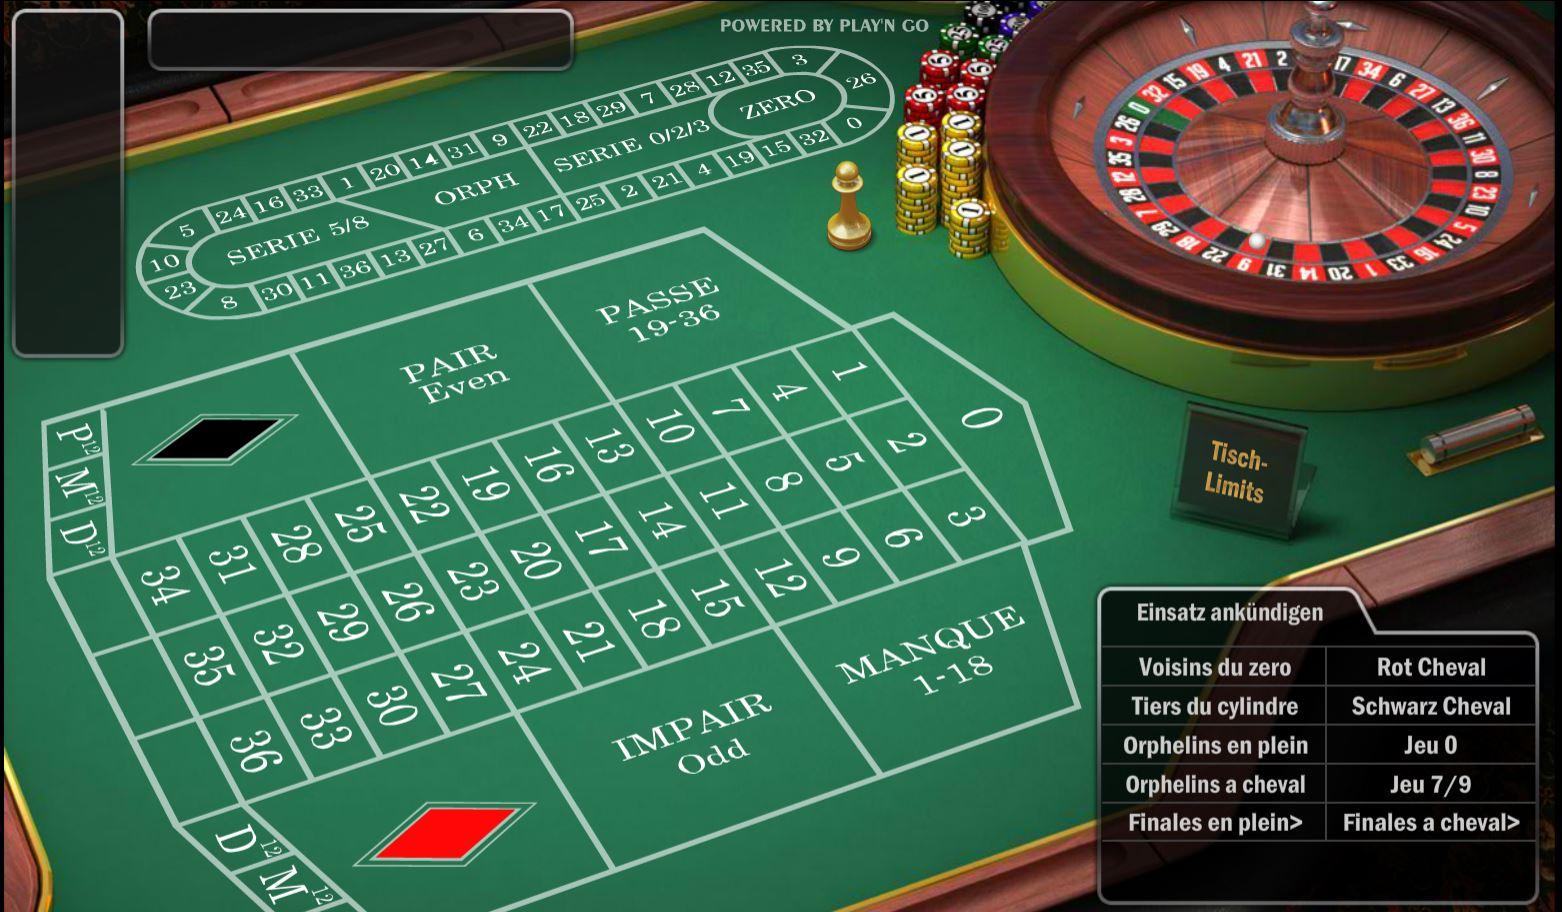 Roulette Strategie pdf - 610717